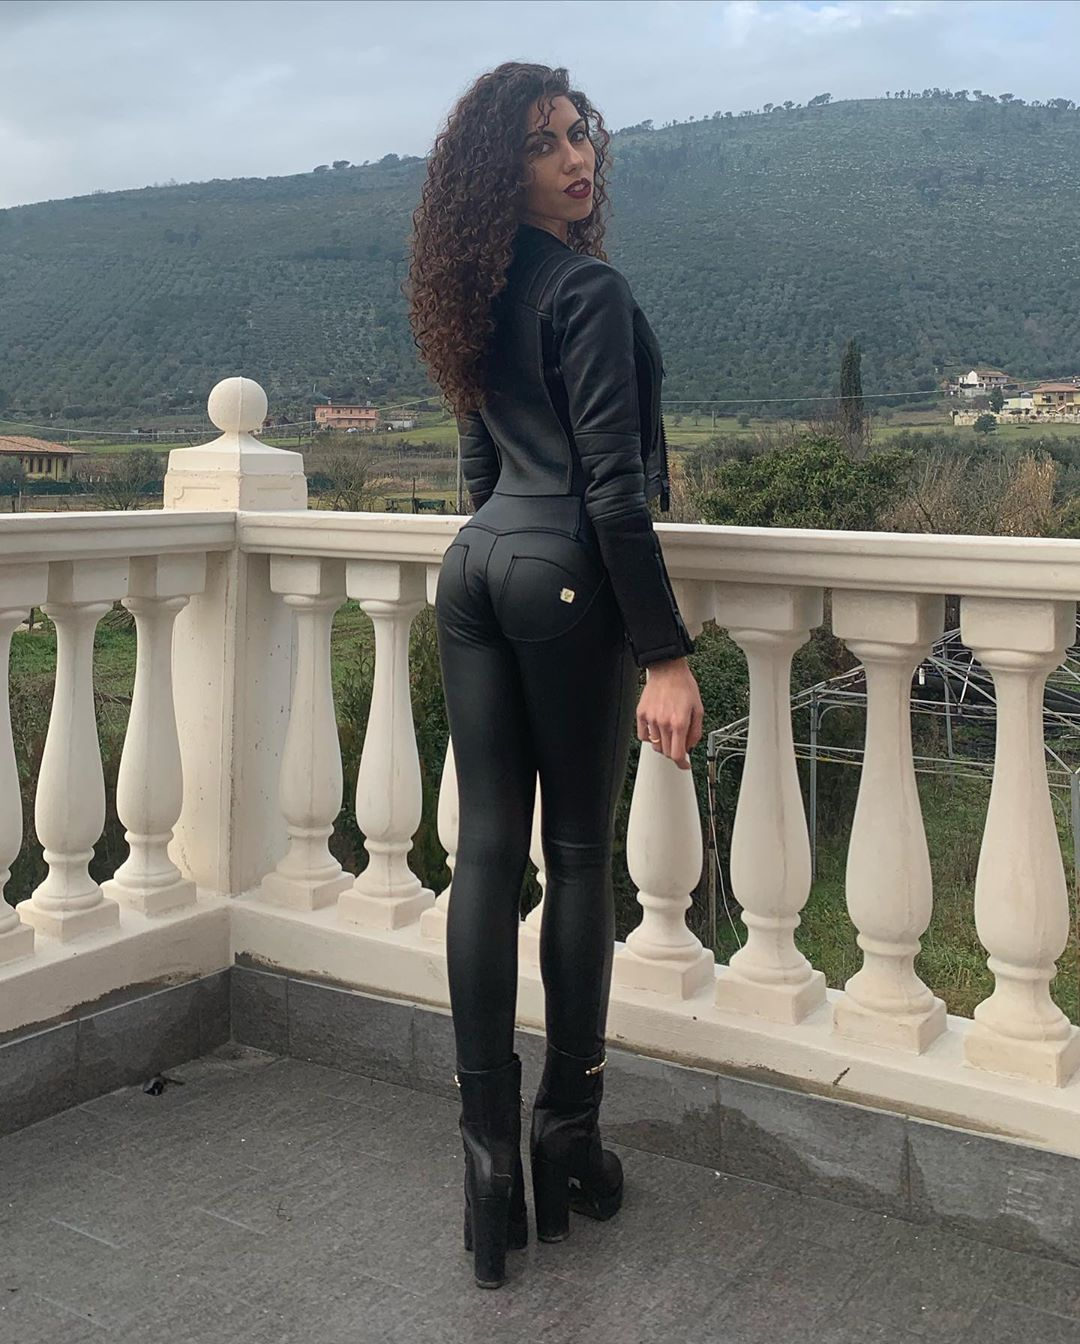 Sara-Quattrociocche-Wallpapers-Insta-Fit-Bio-2